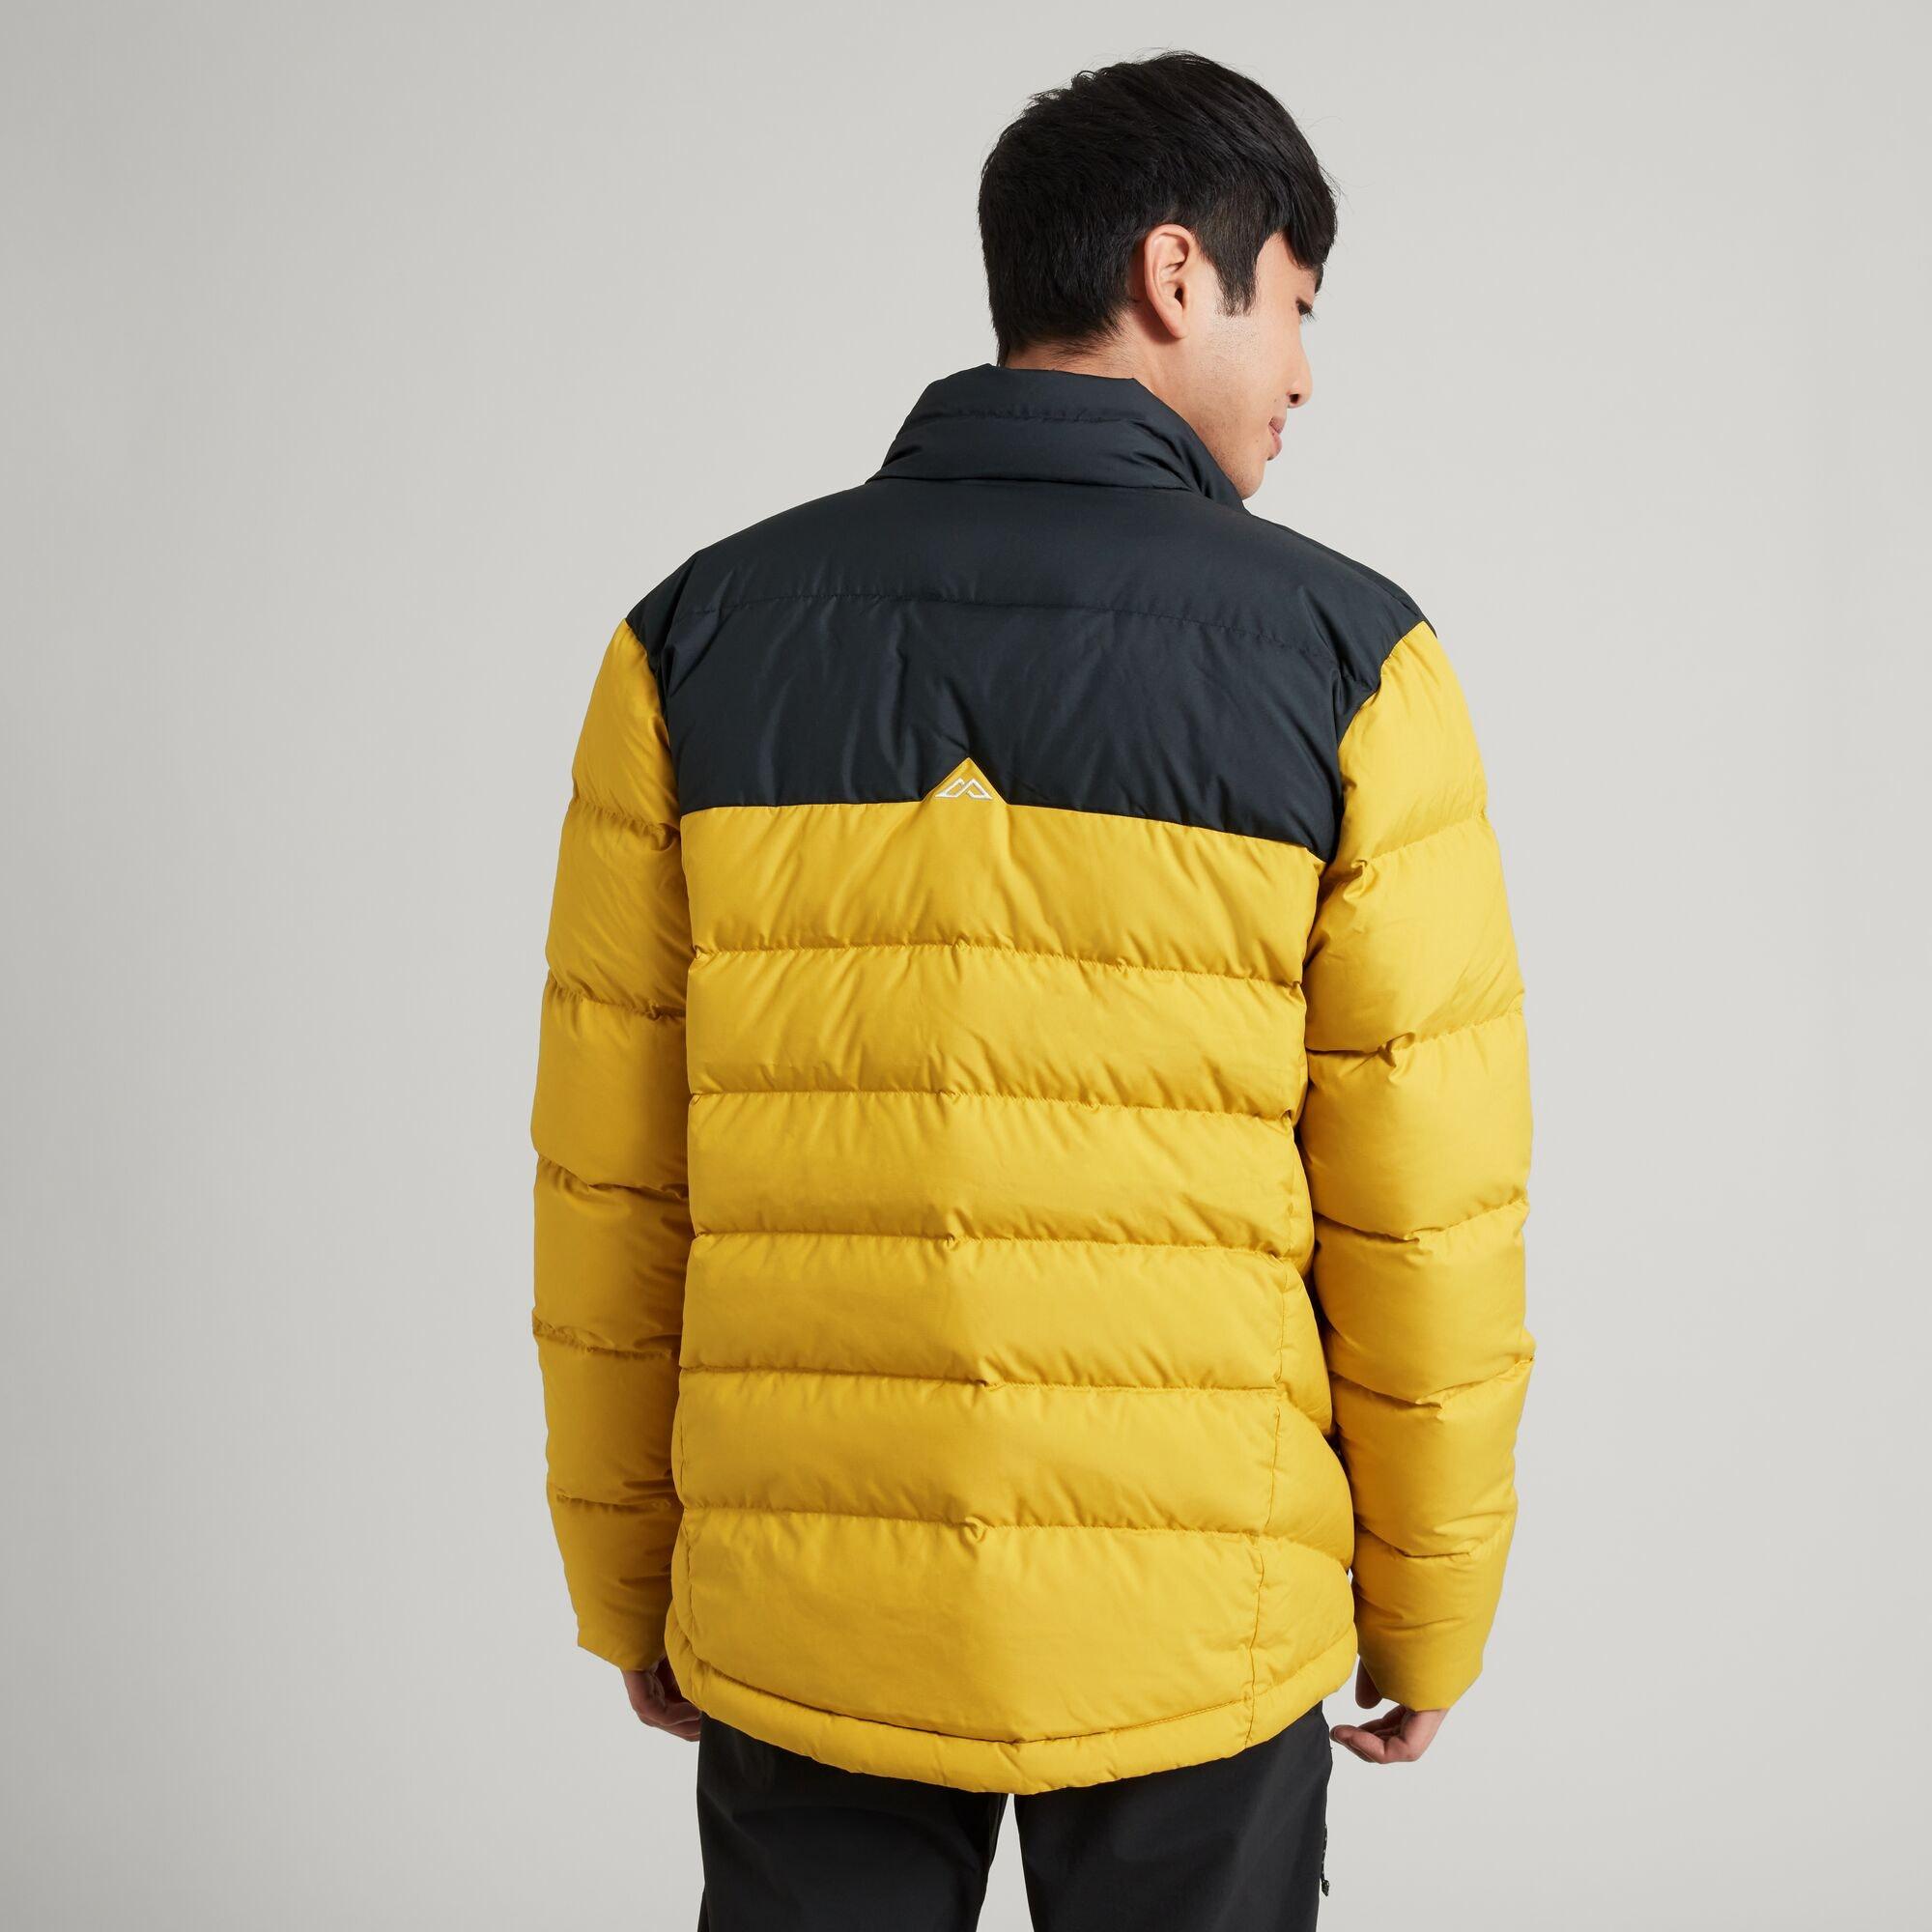 thumbnail 9 - NEW Kathmandu Epiq Mens 600 Fill Down Puffer Warm Outdoor Winter Jacket